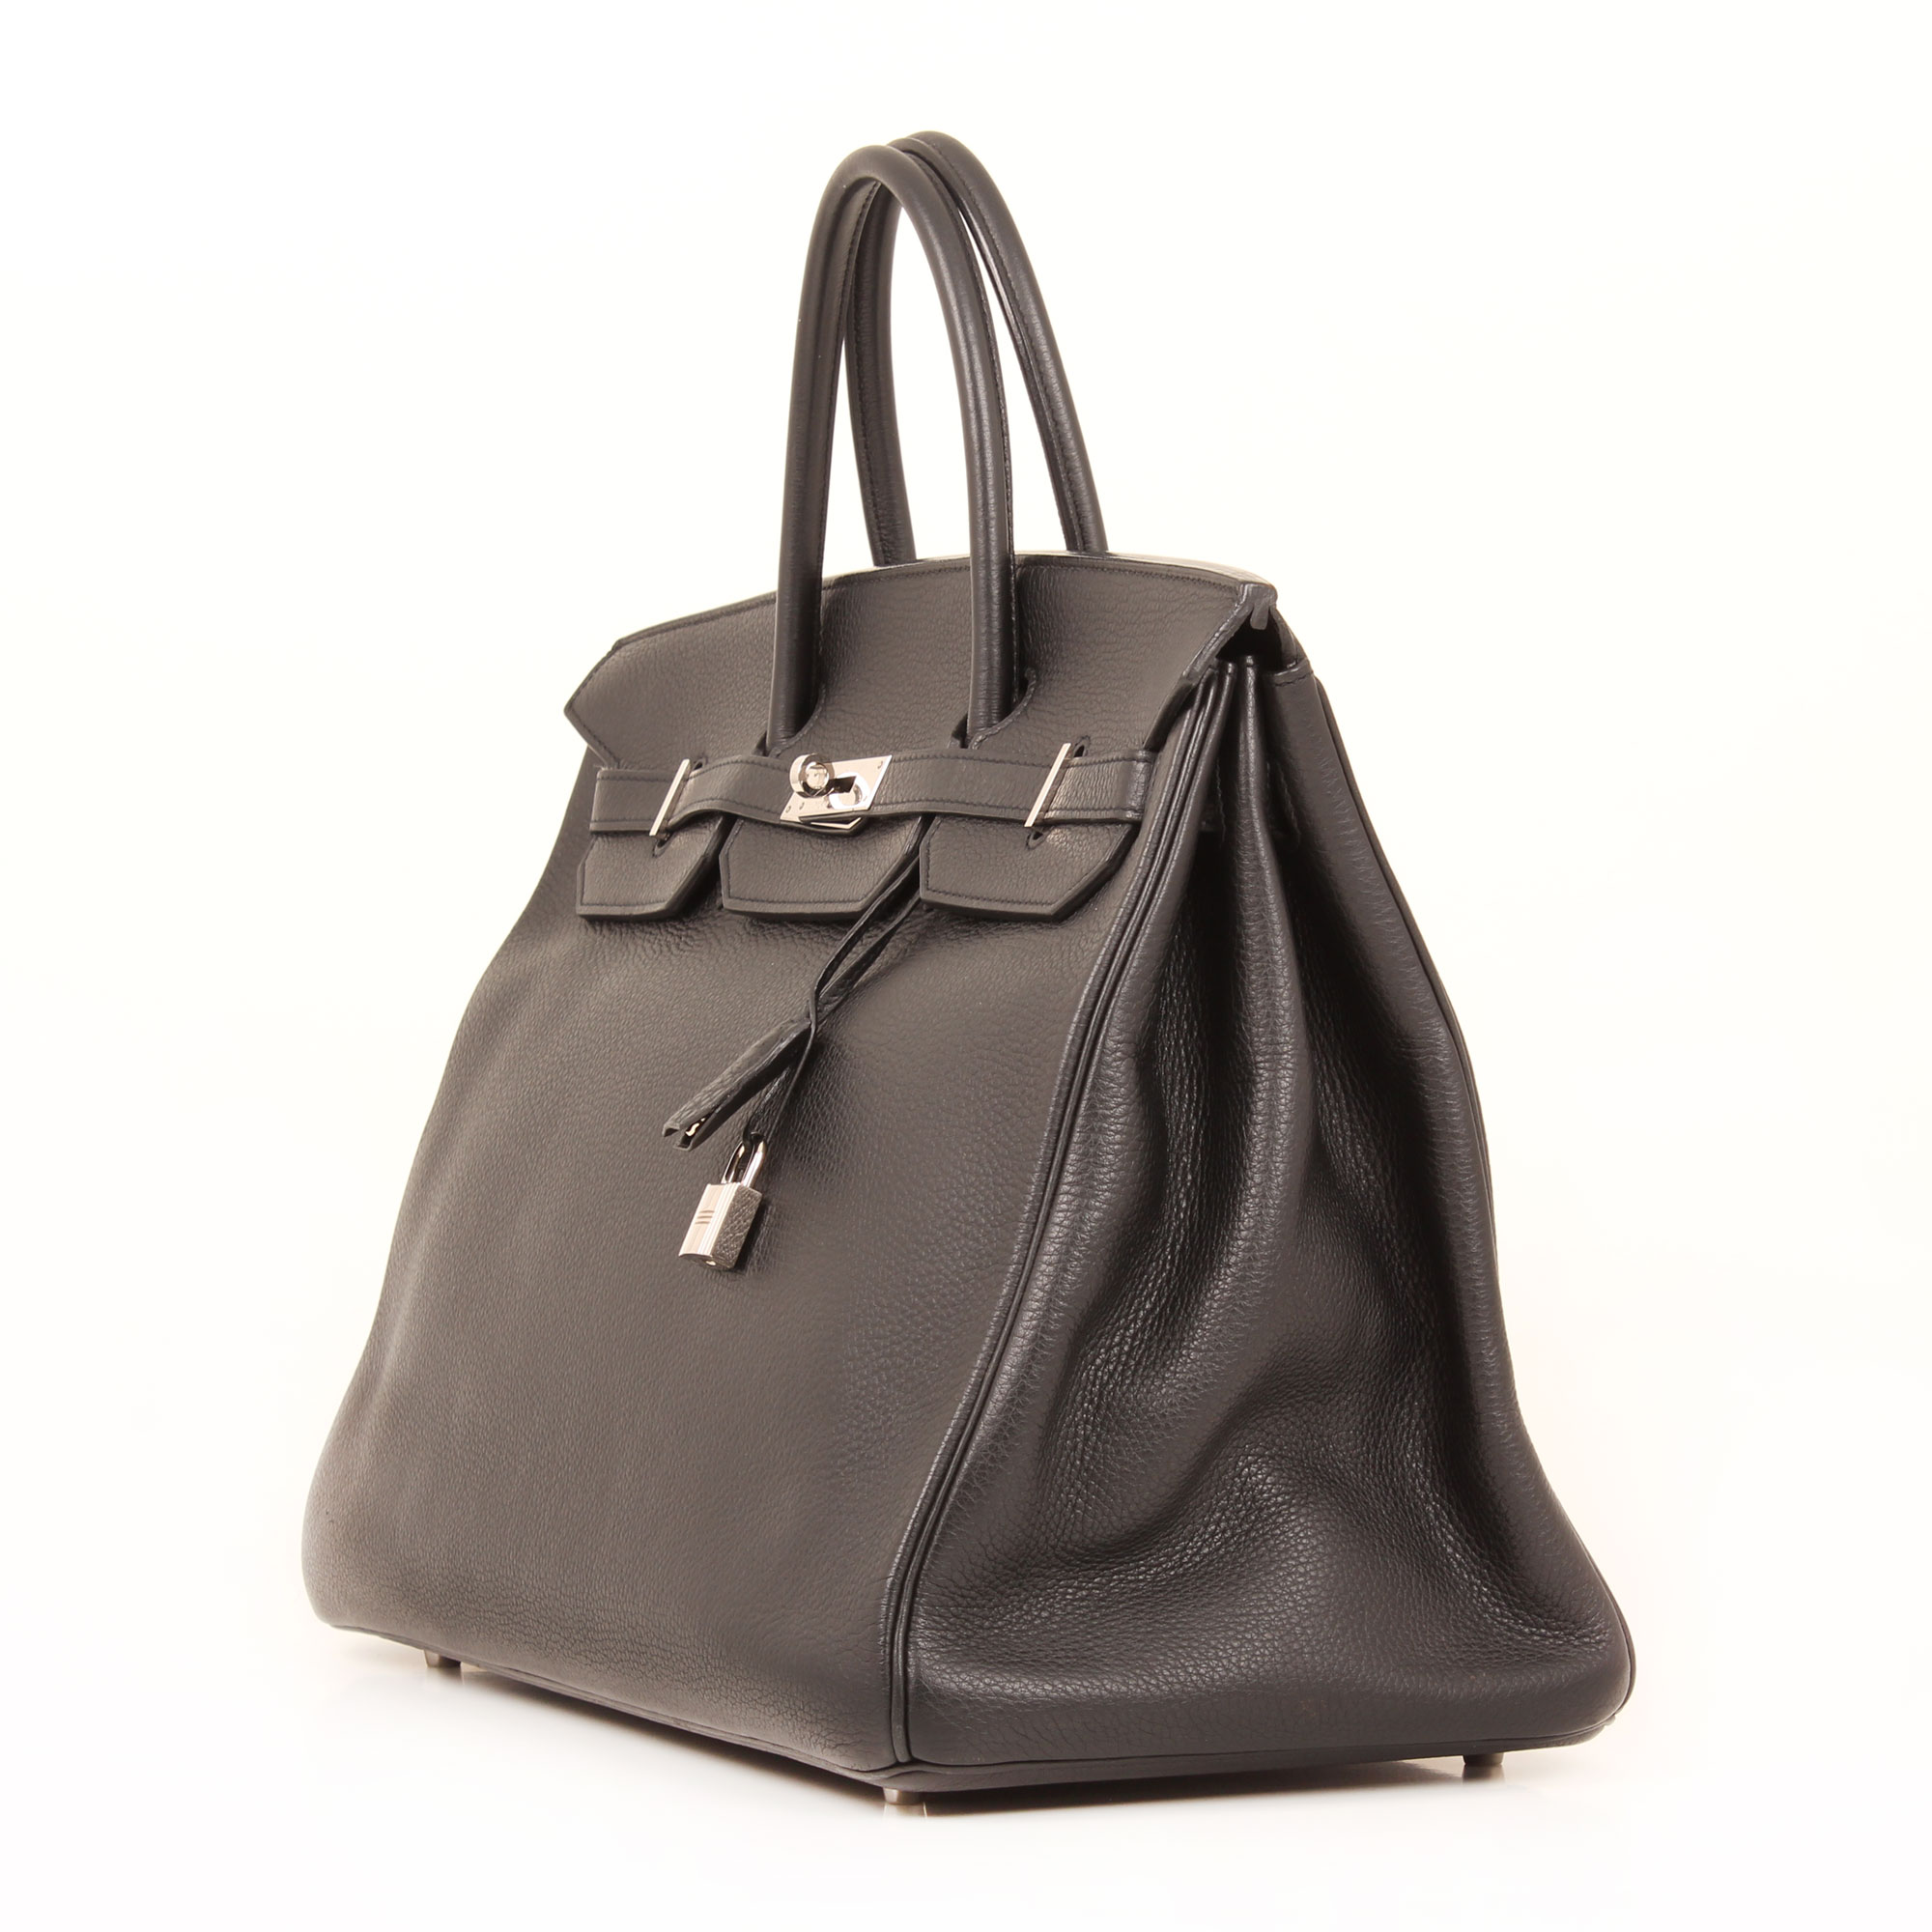 f09c4493852 Hermès Birkin 40 Handbag Togo Leather Black Palladium I CBL Bags